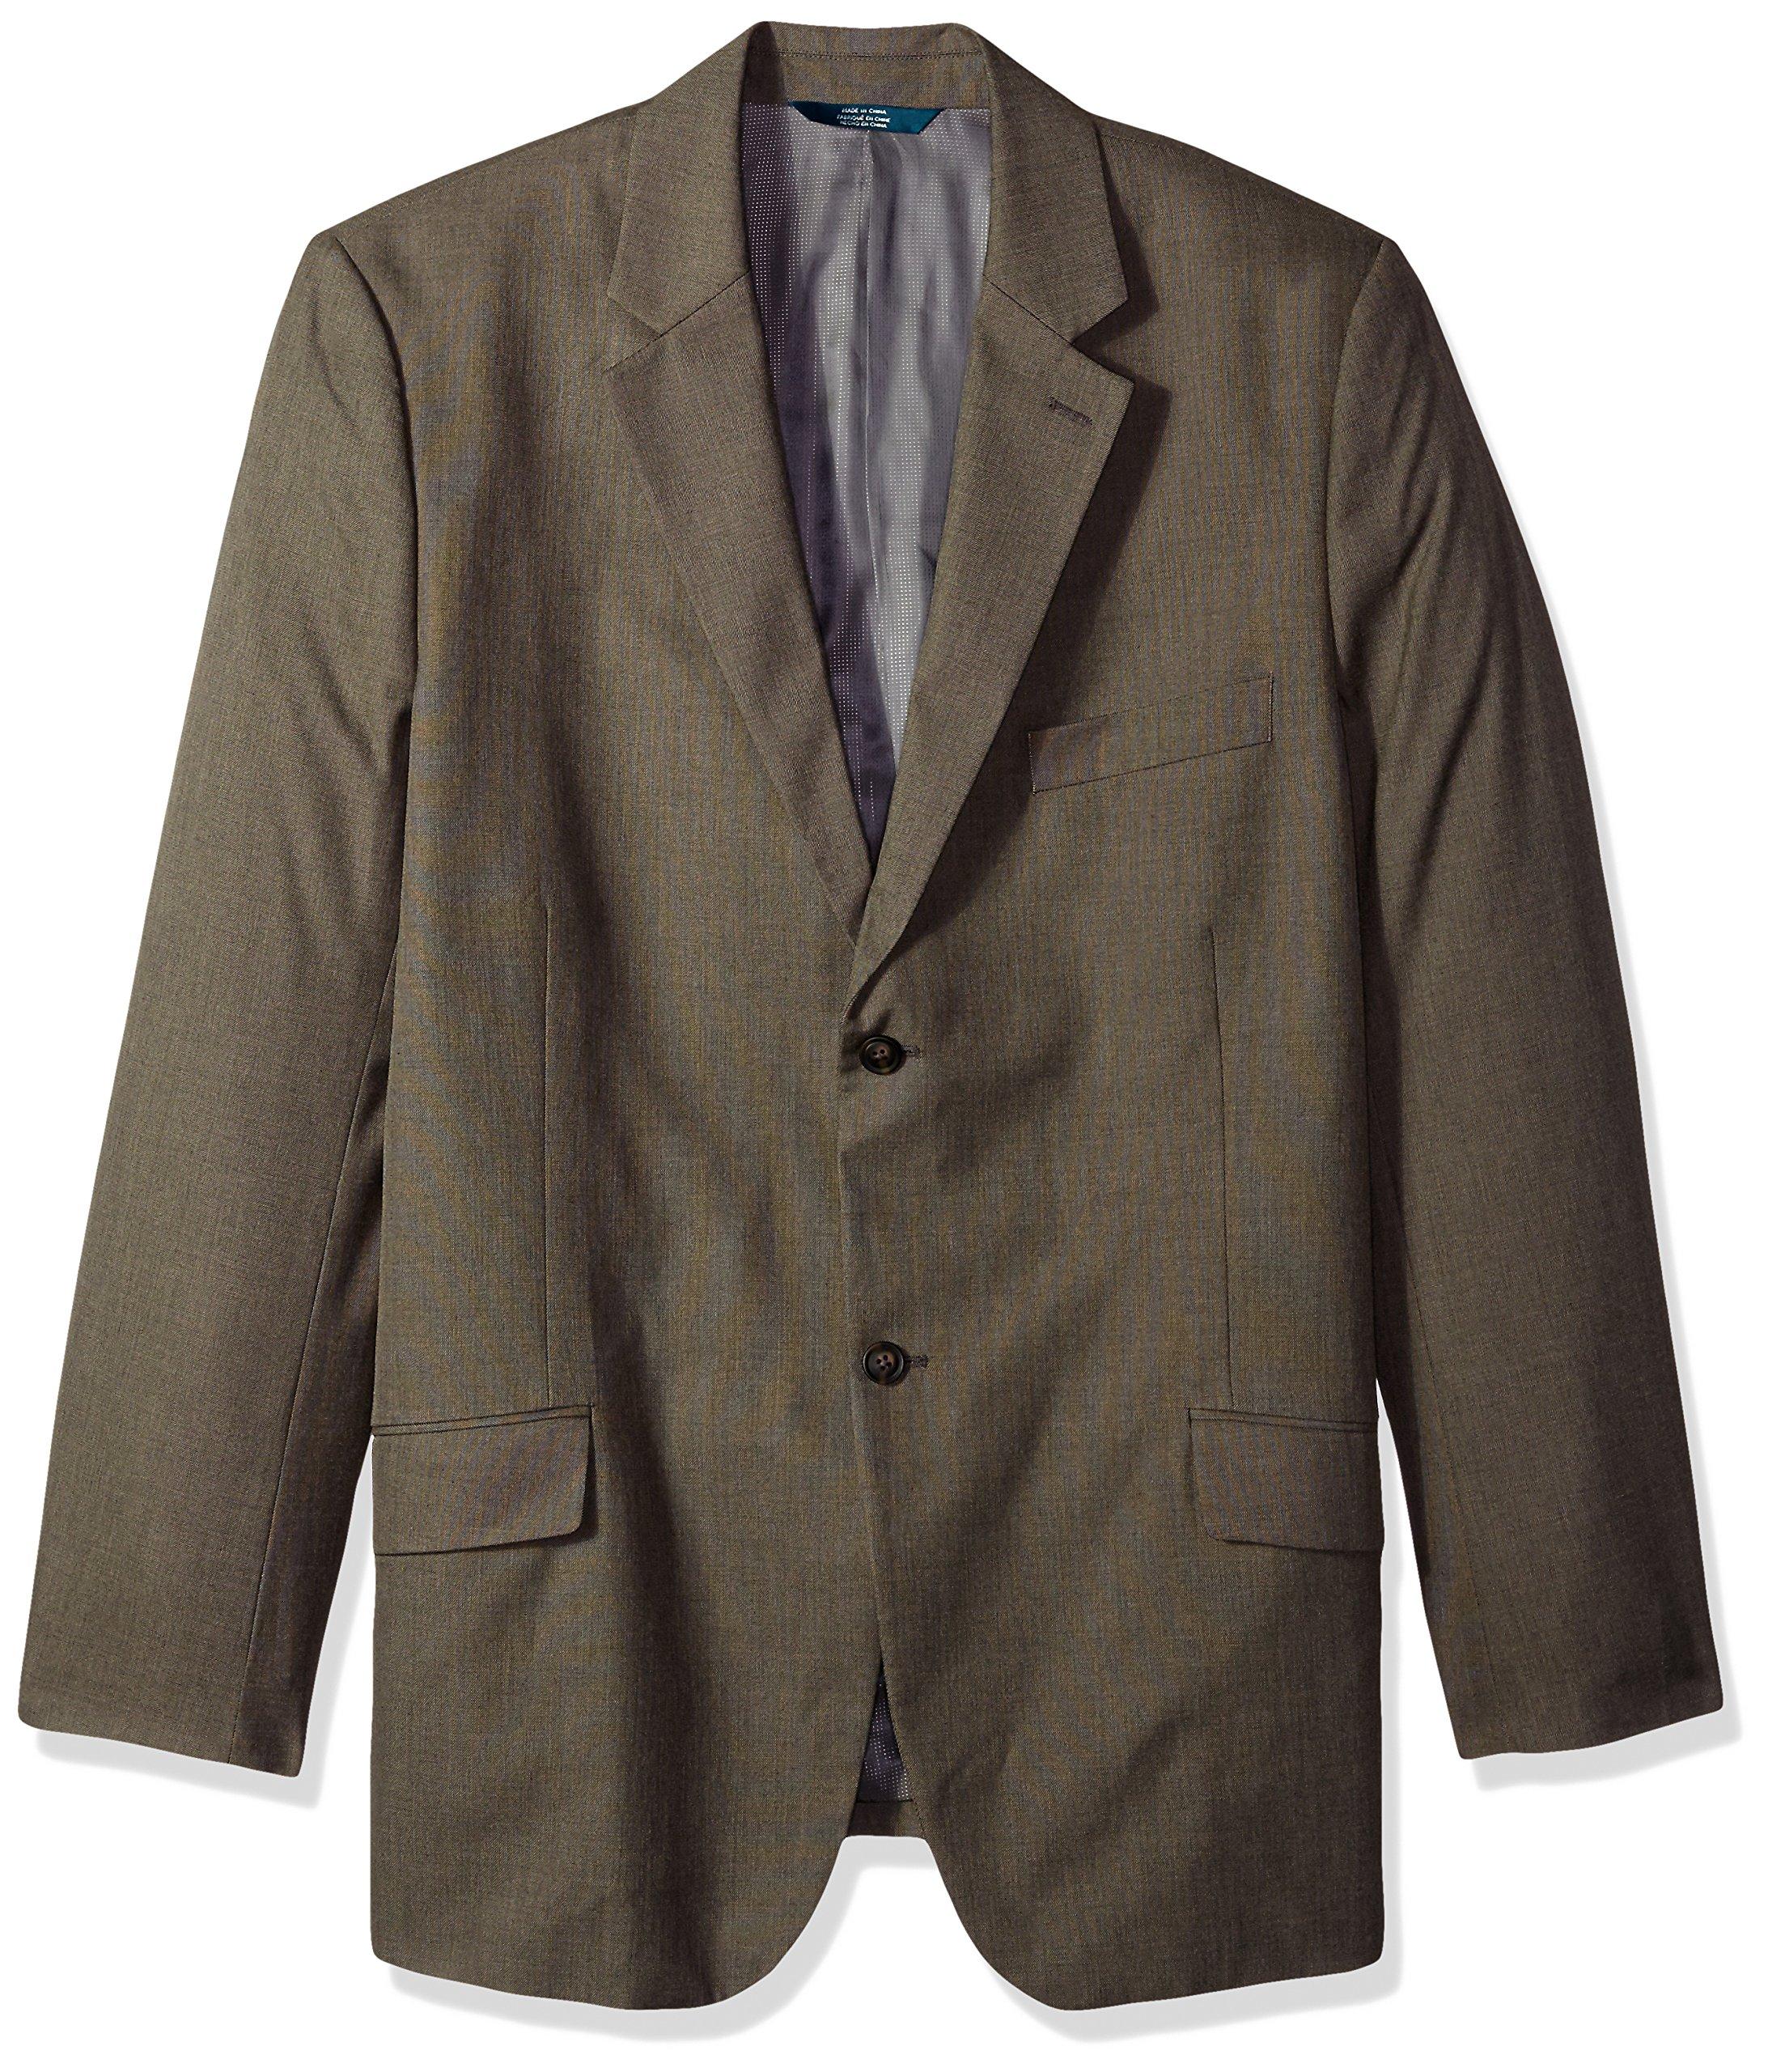 Perry Ellis Men's Big and Tall Fit Pattern Twill Suit Jacket, Chinchilla, 50-Regular